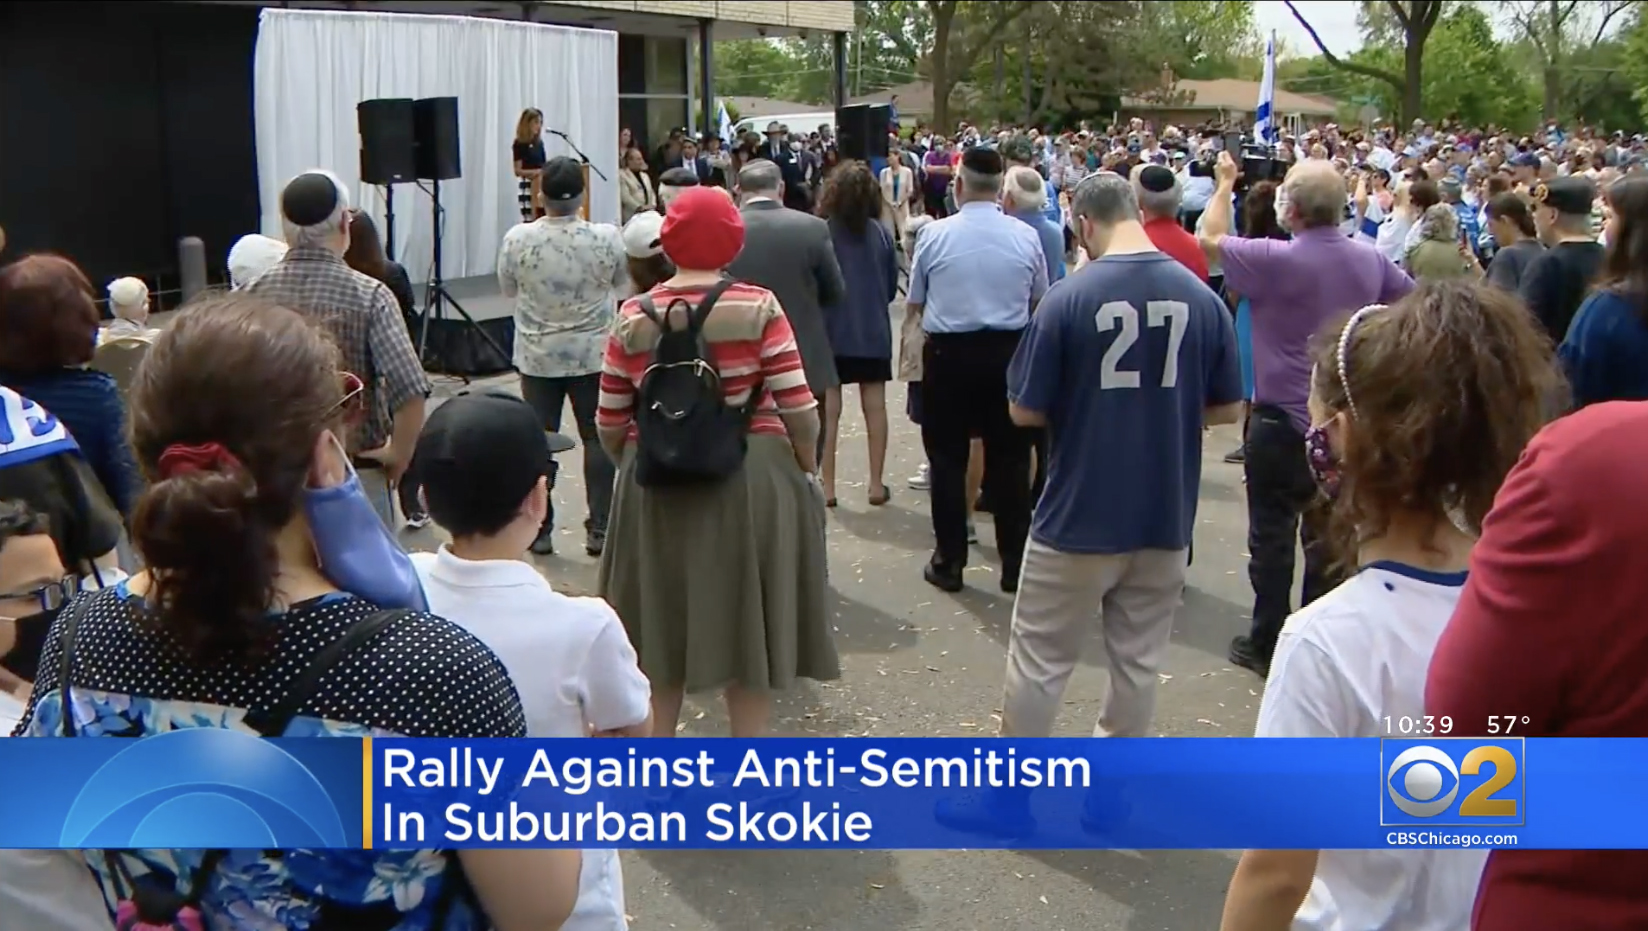 Skokie-rally-CBS_5-23-2021jpg